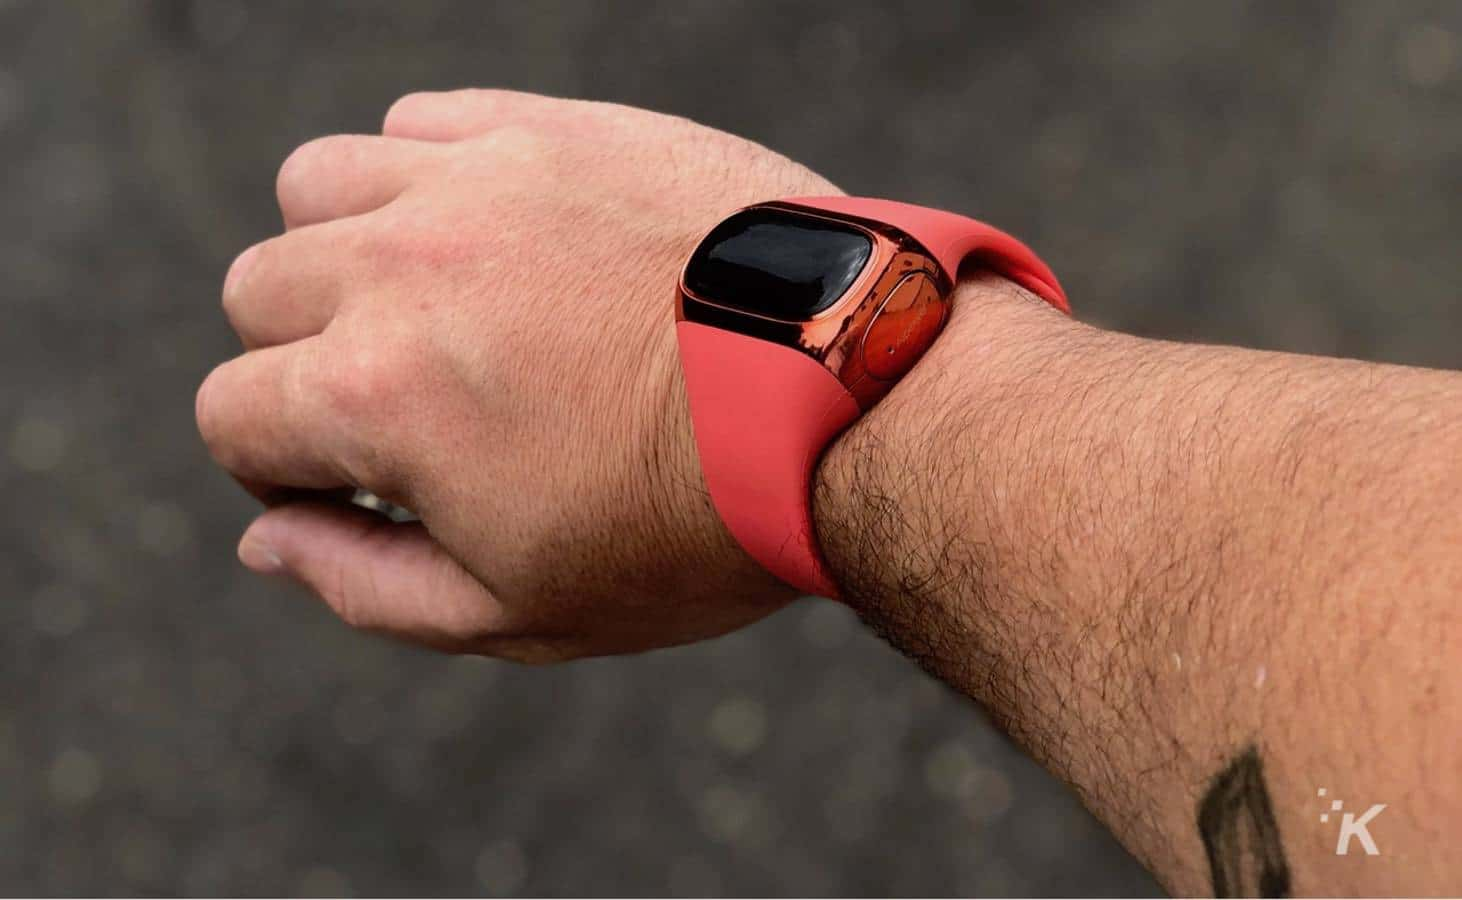 wearbuds kickstarter on kevin raposo wrist